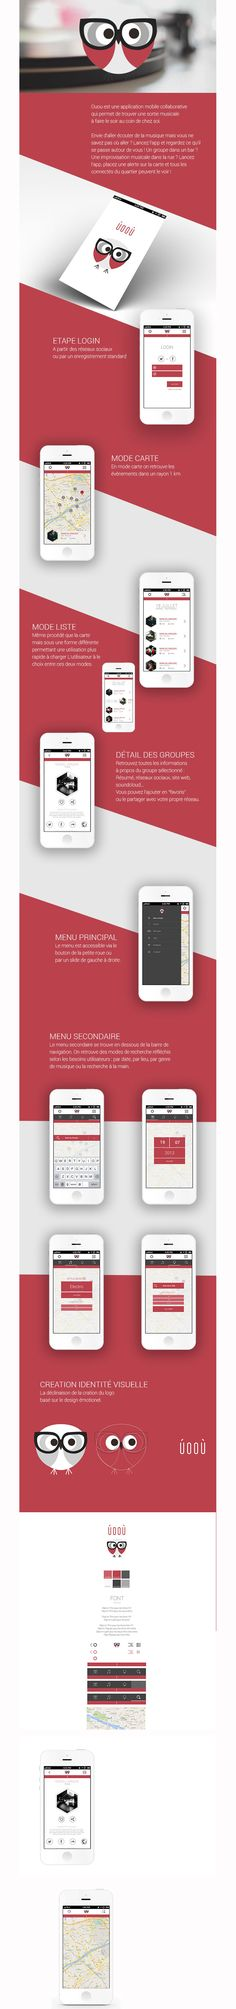 Mobile app design - nice colours and i love the owl logo. #mobile #webdesign #layout #design